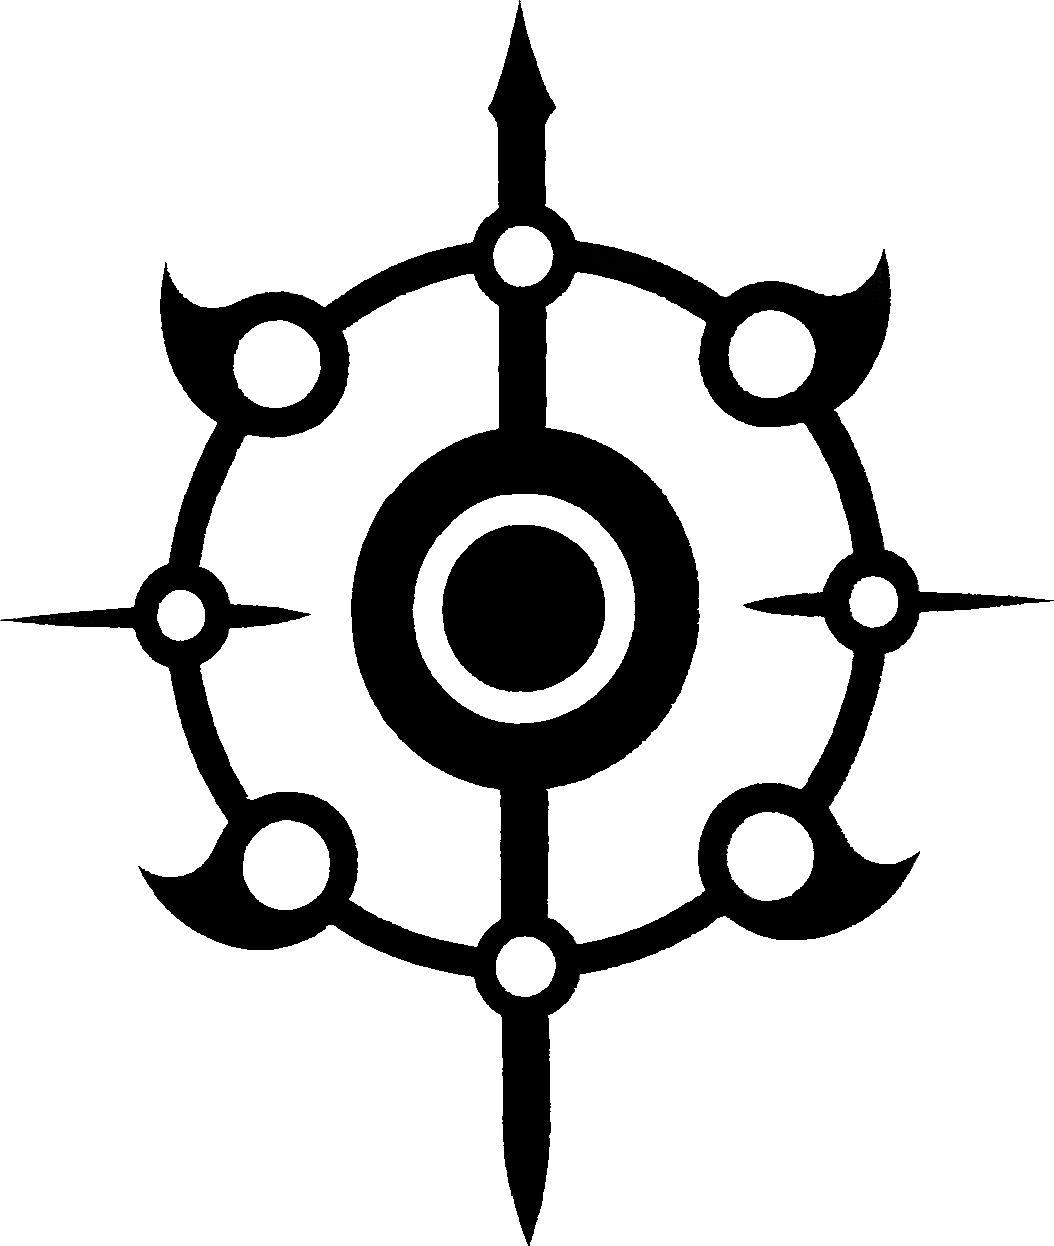 naruto clans symbols tattoos i love naruto BS Symbol naruto clans symbols